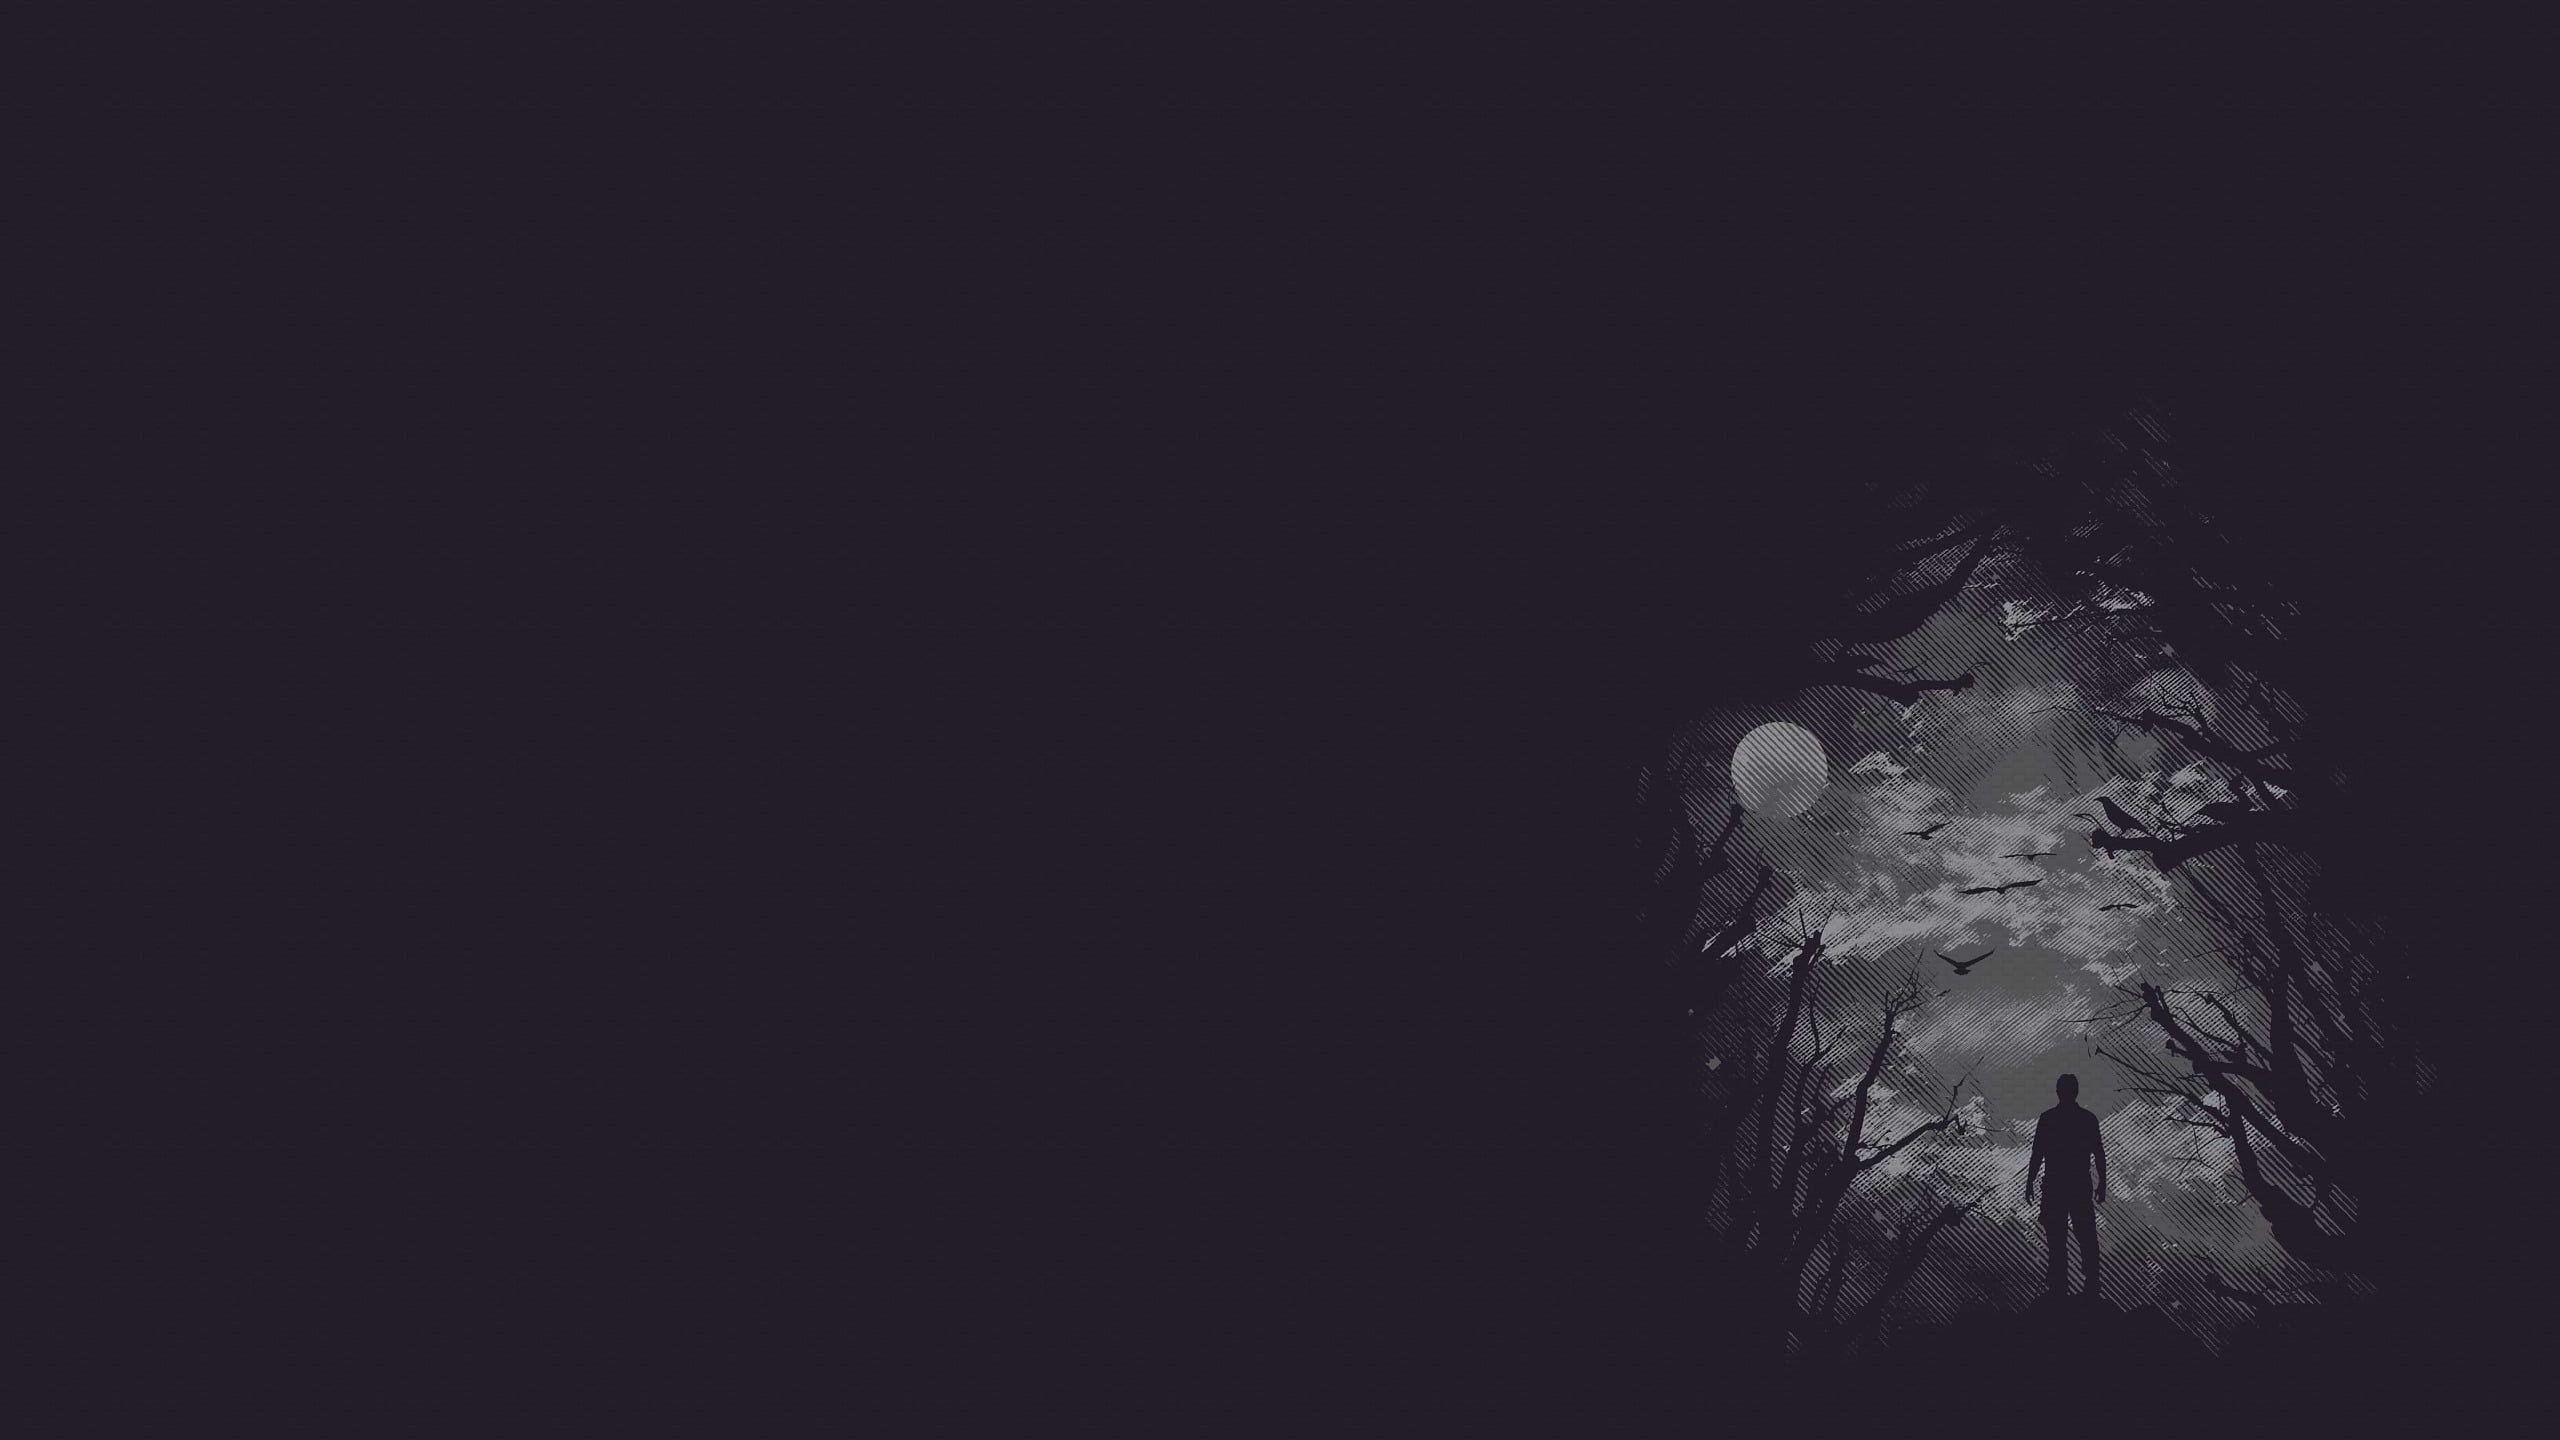 Silhouette Of Man Illustration Night Moon Dark Minimalism Digital Art 2k Wallpaper Hdwallp Minimalist Desktop Wallpaper Background Pictures Hd Wallpaper Dark minimalist wallpaper hd